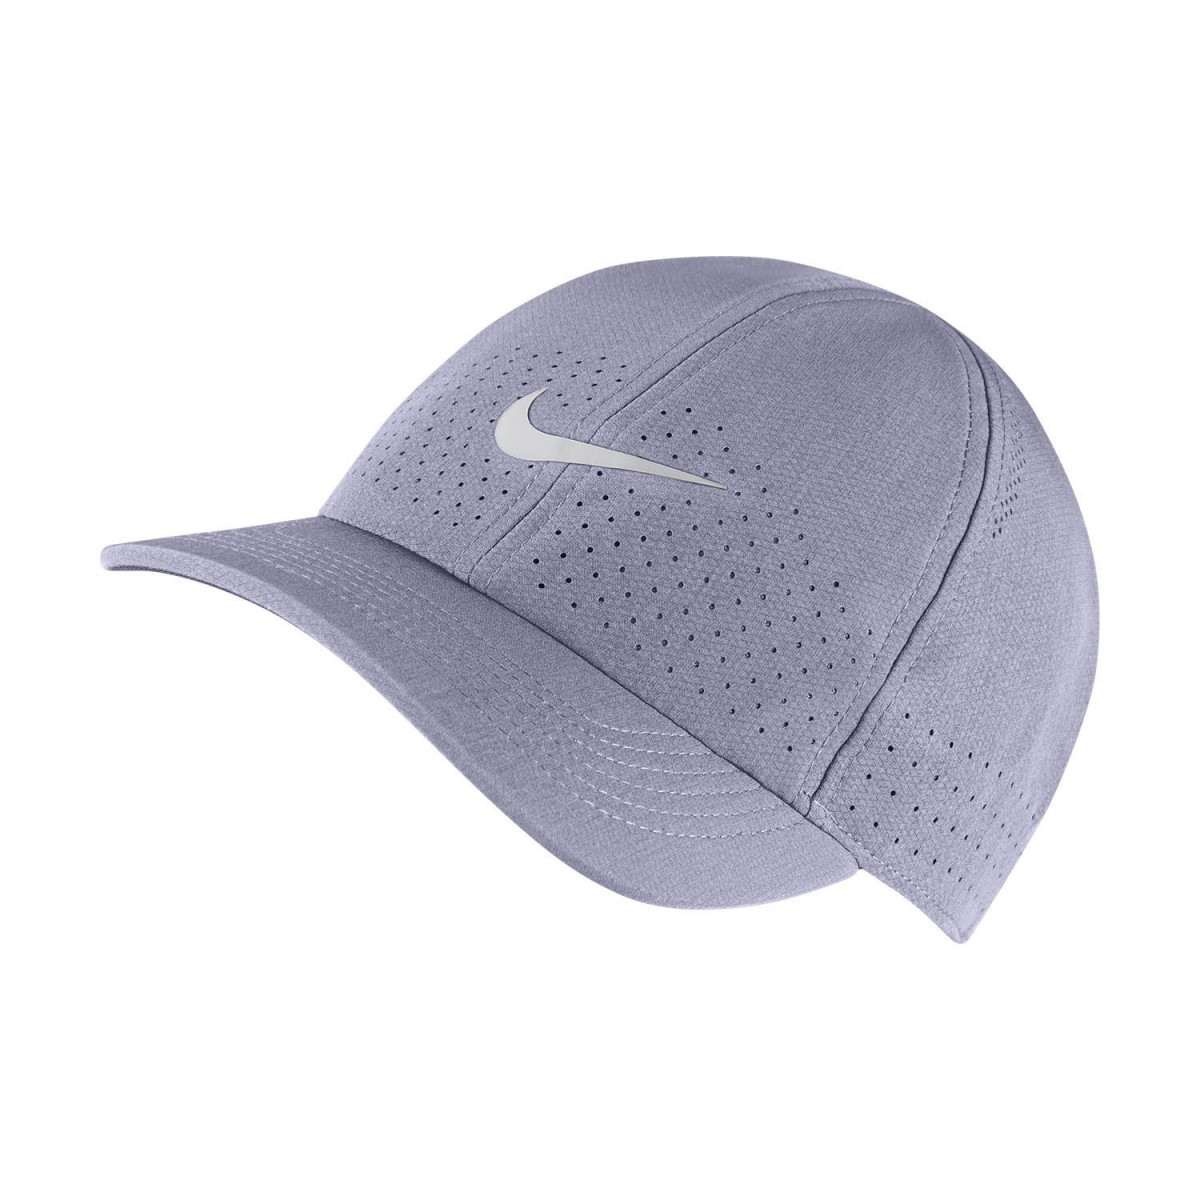 Теннисная кепка Nike Court Aerobill Advantage Cap indigo haze/white